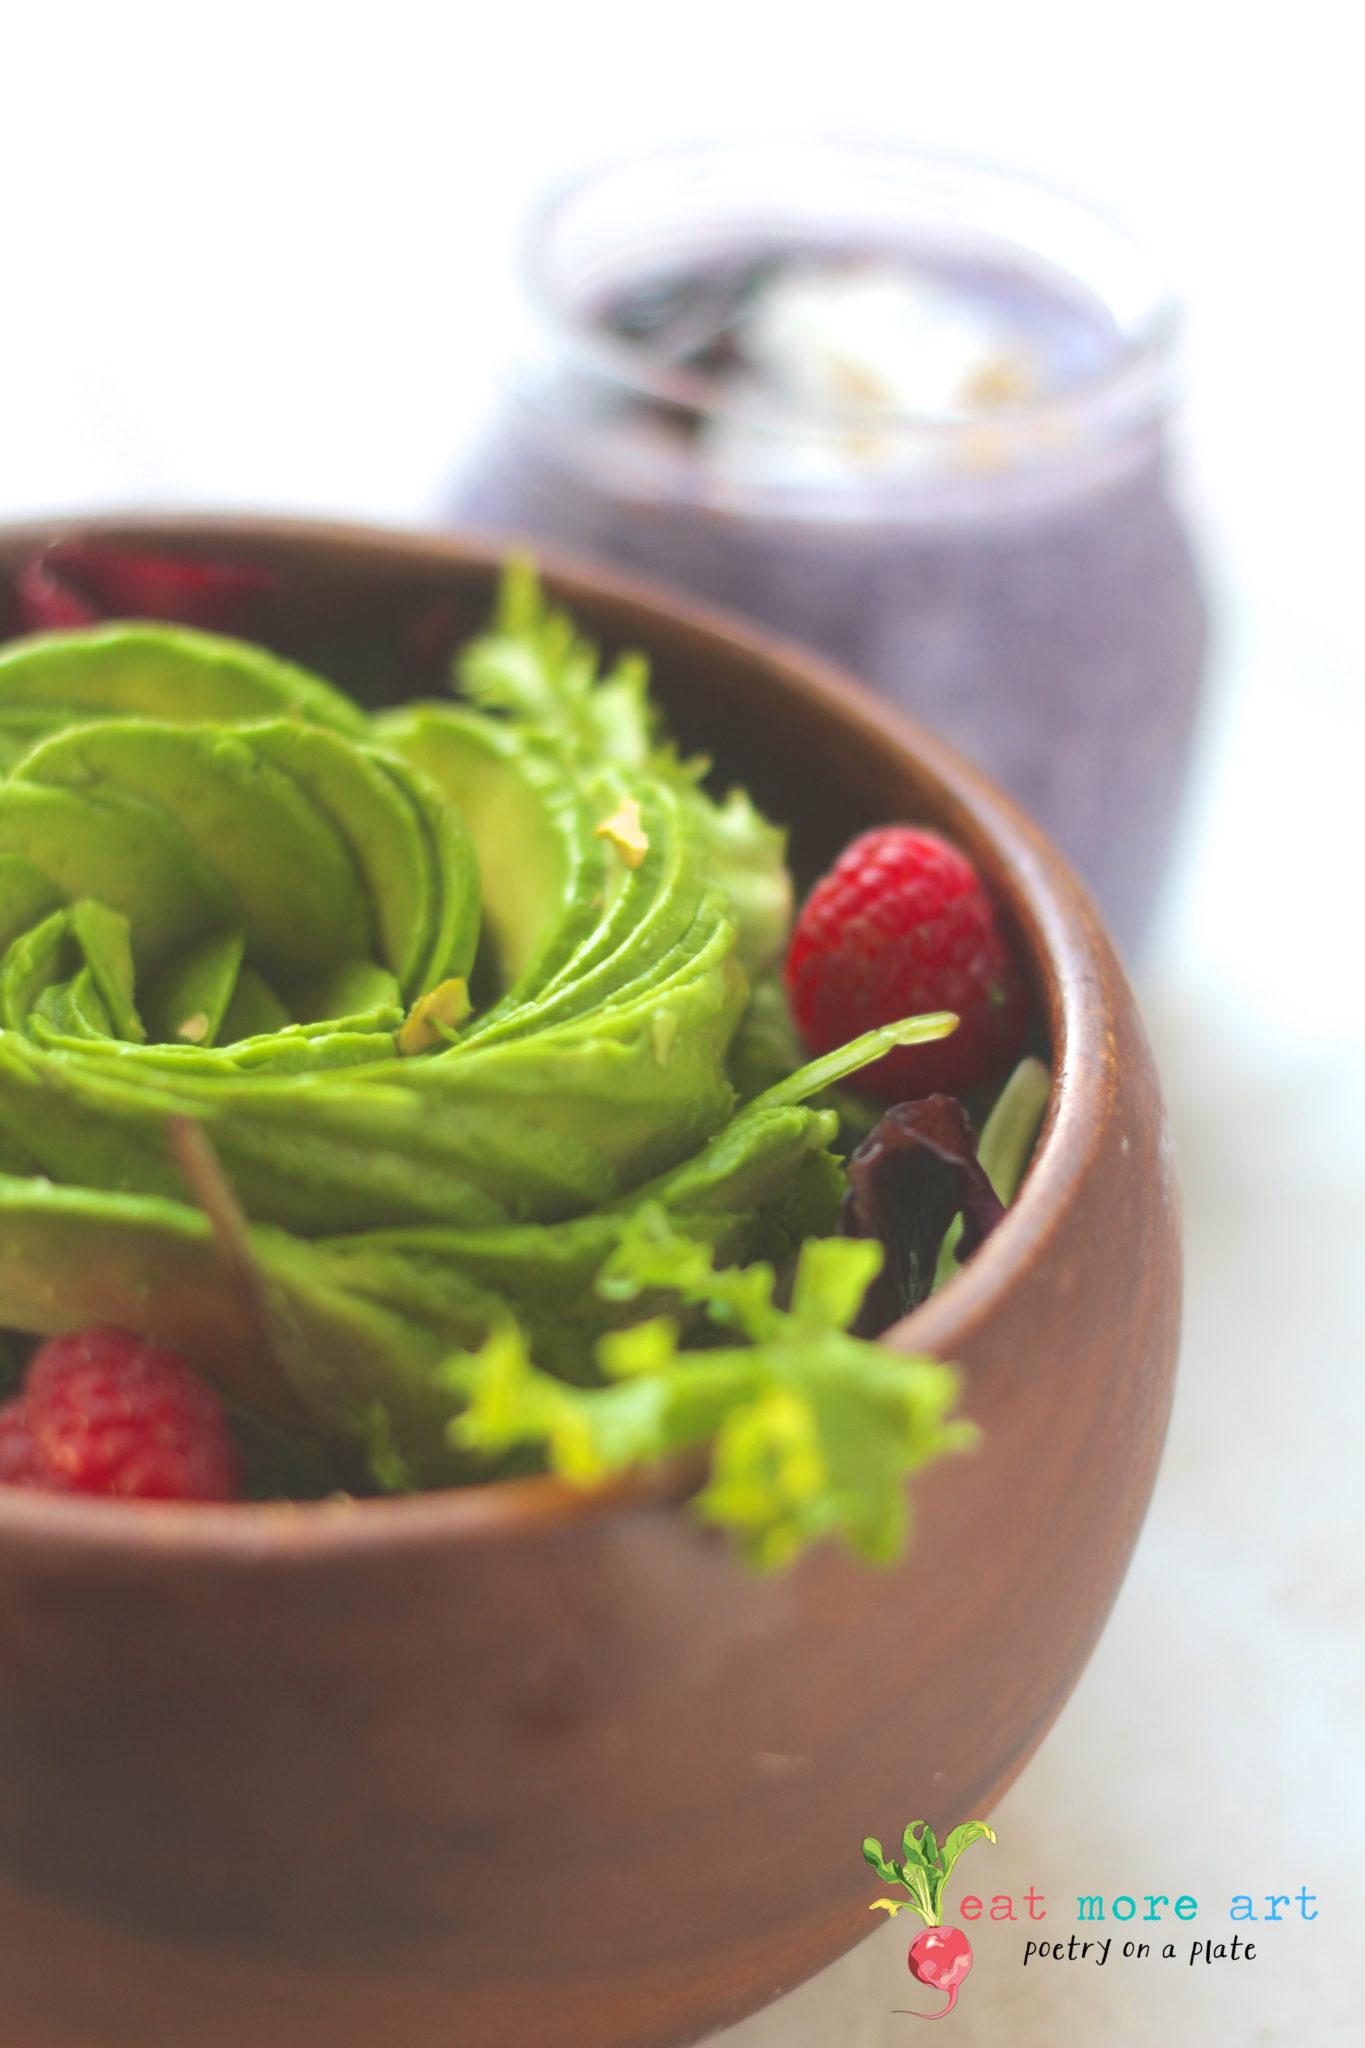 ''Tis the Season' Salad | Avocado, Greens & Raspberries | Eat More Art